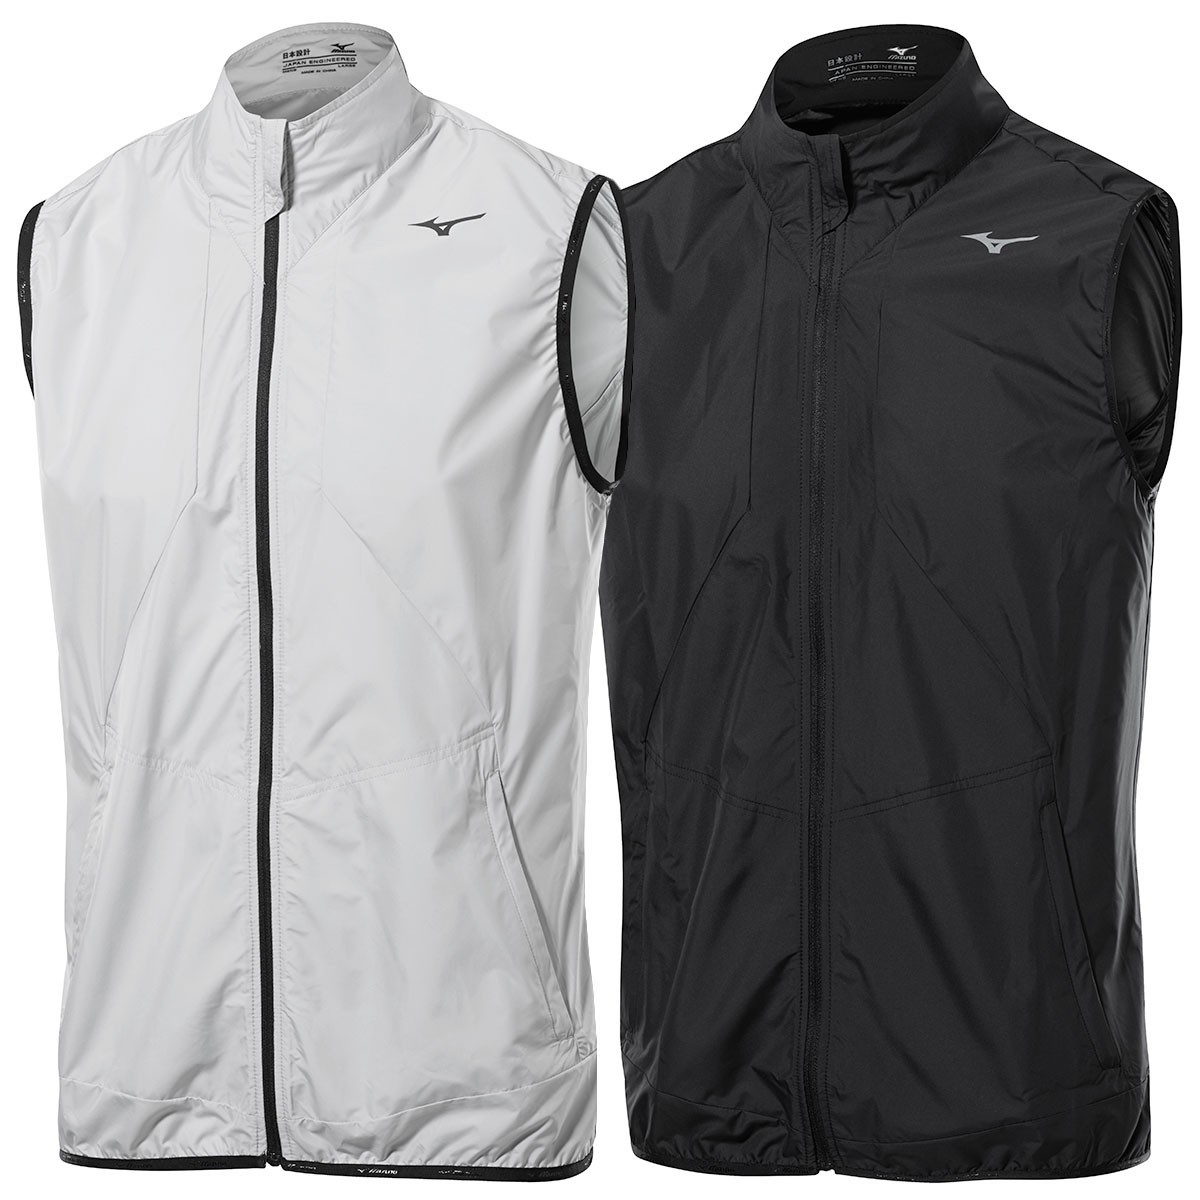 9b823ec9ac135 ... Mizuno Golf Mens FZ Wind Vest Sleeveless Jacket.   Back. 52GE7001